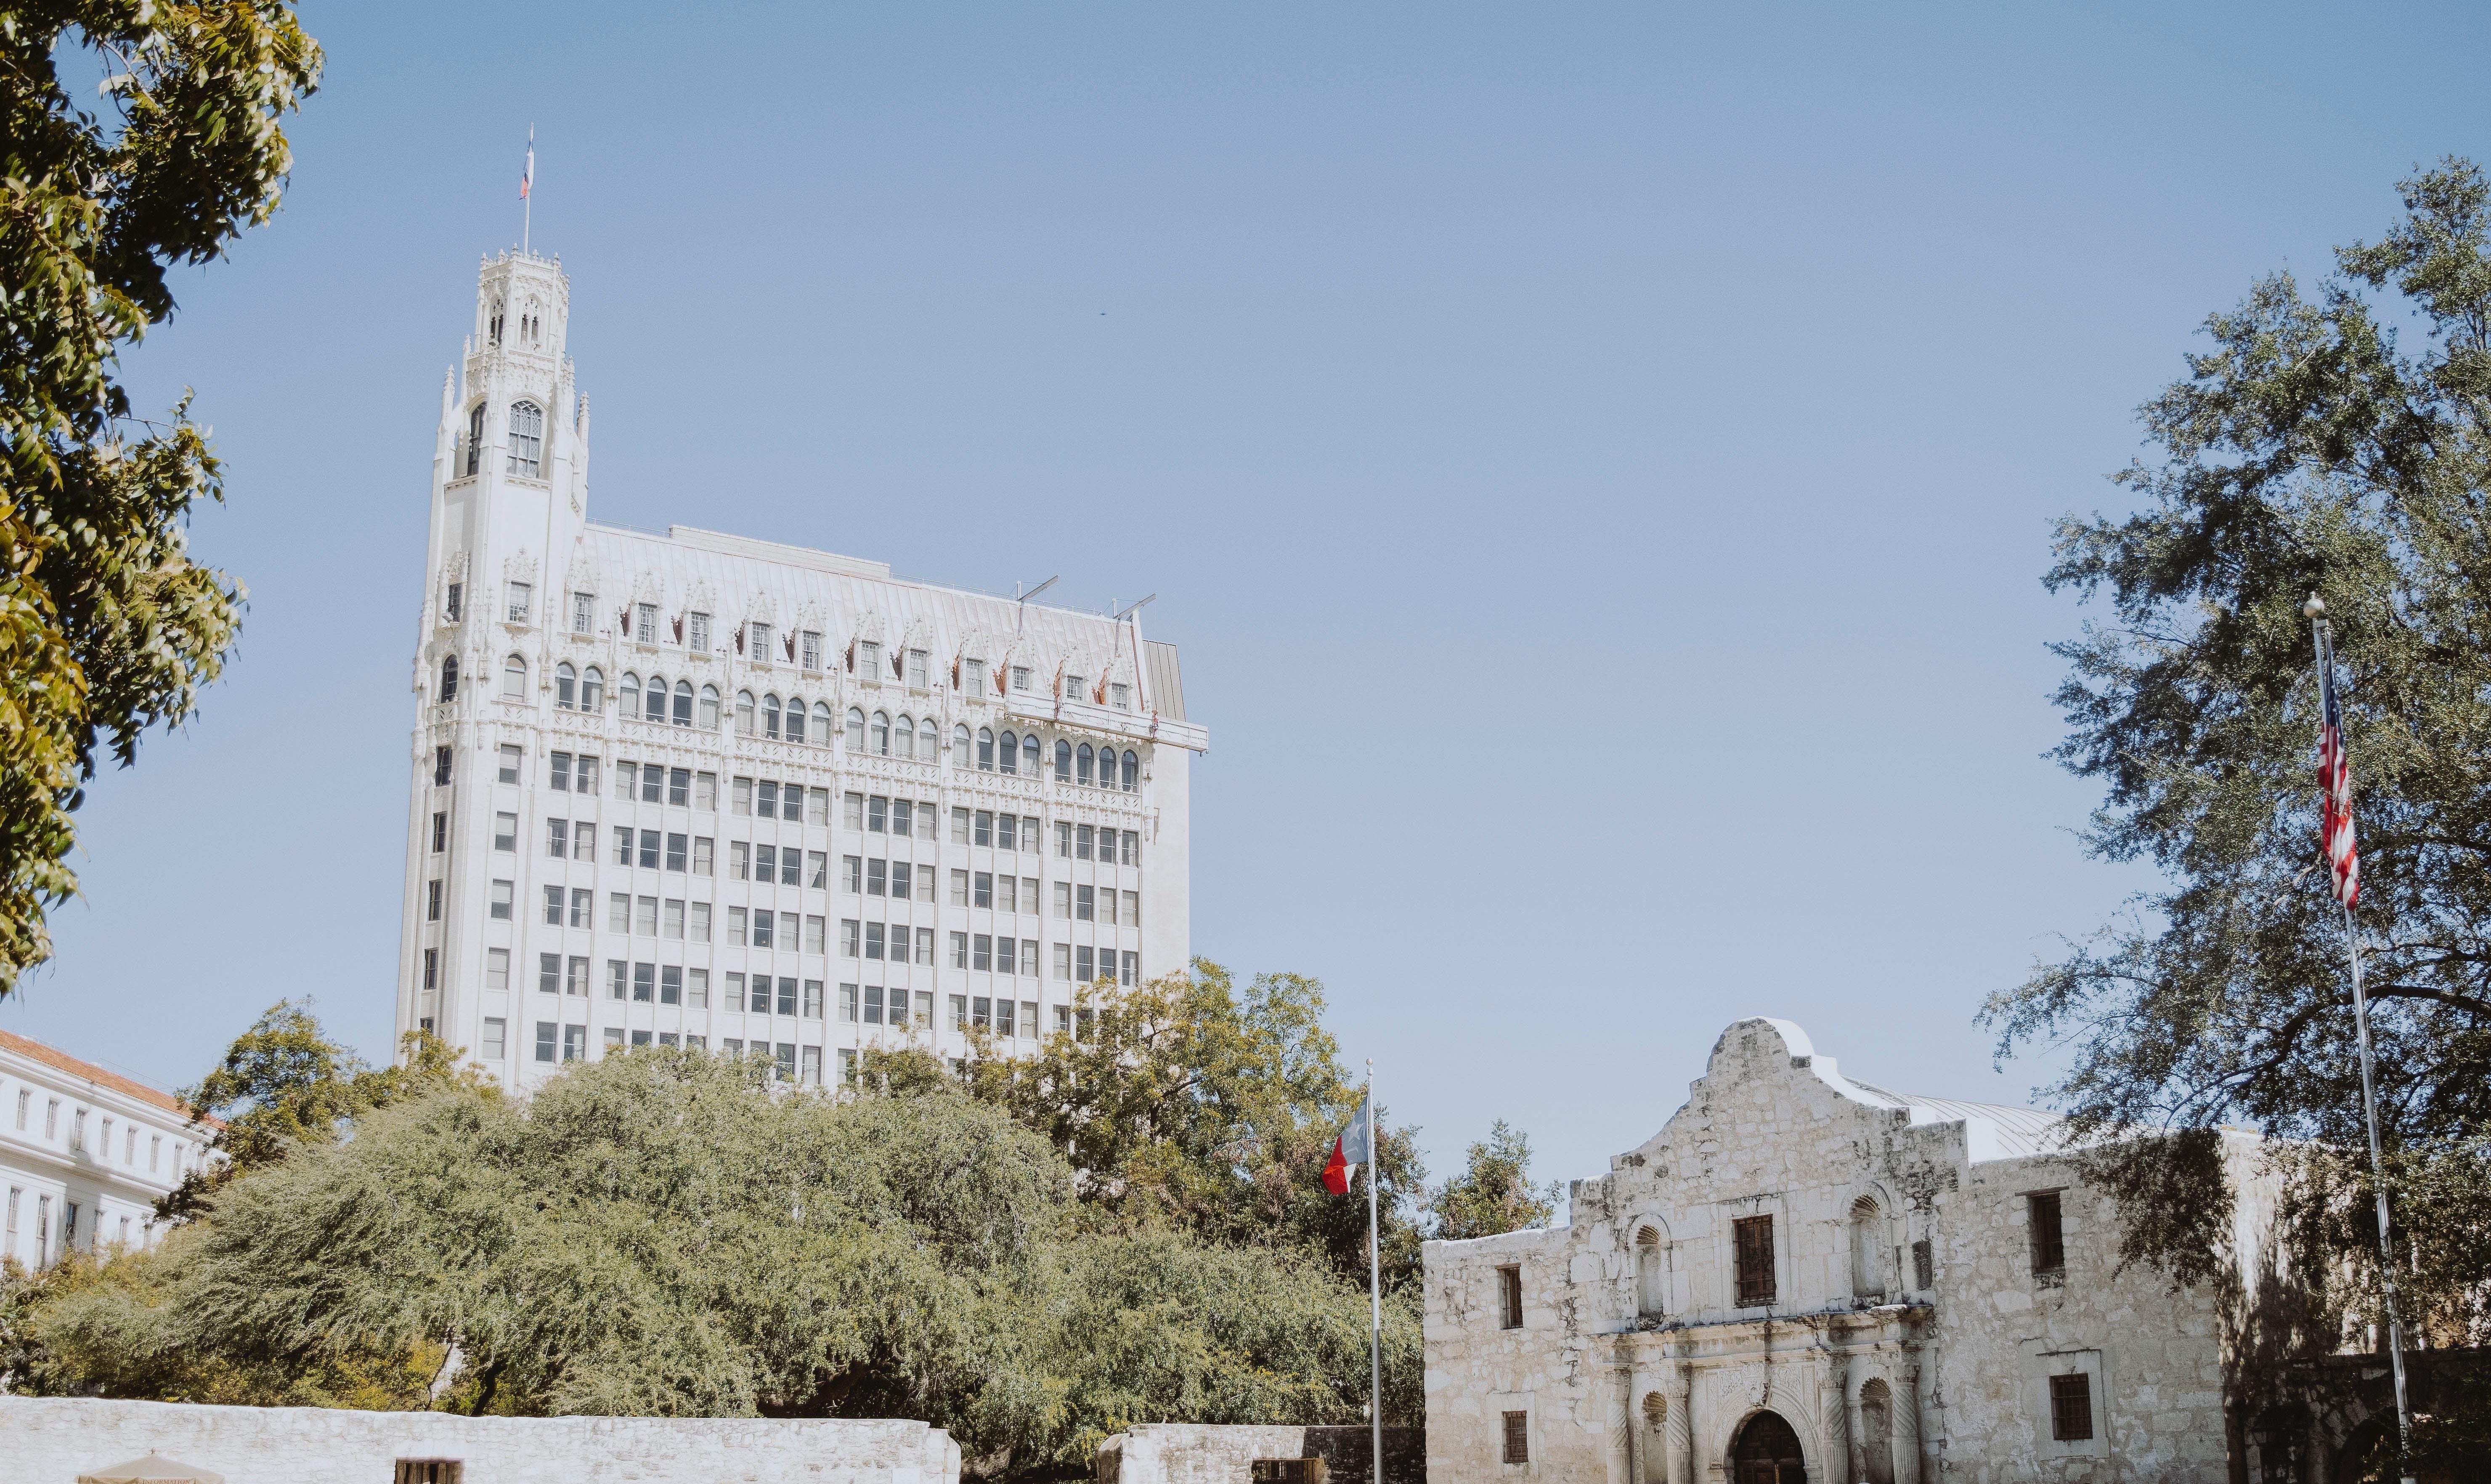 48 Hours In San Antonio, Texas